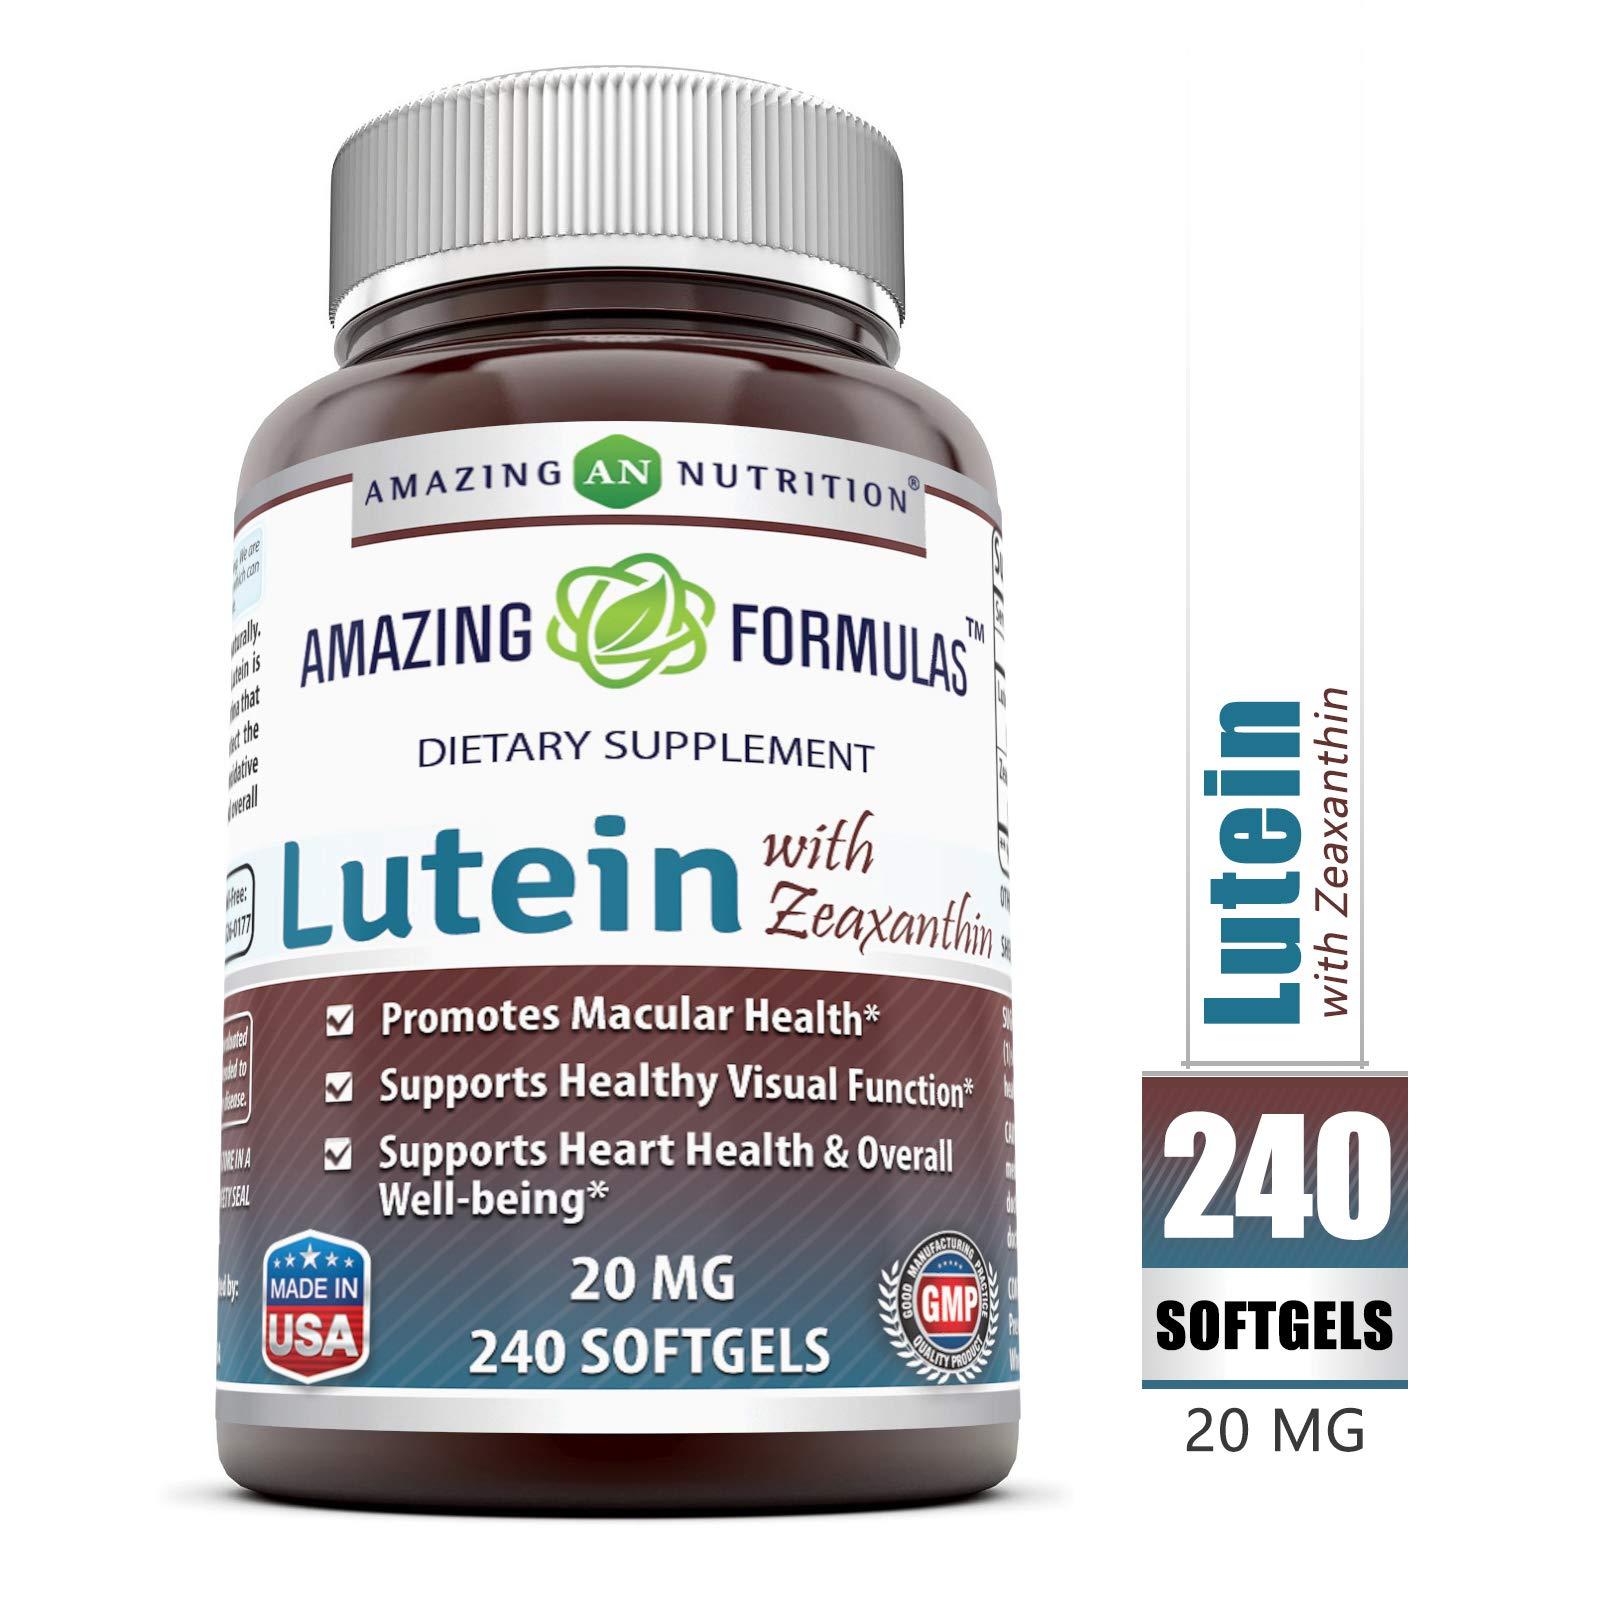 Amazing Nutrition Amazing Formulas Lutein 20 mg with Zeaxanthin 800 mcg- 240 Softgels- Supports Eye Health & Healthy Vision by Amazing Nutrition